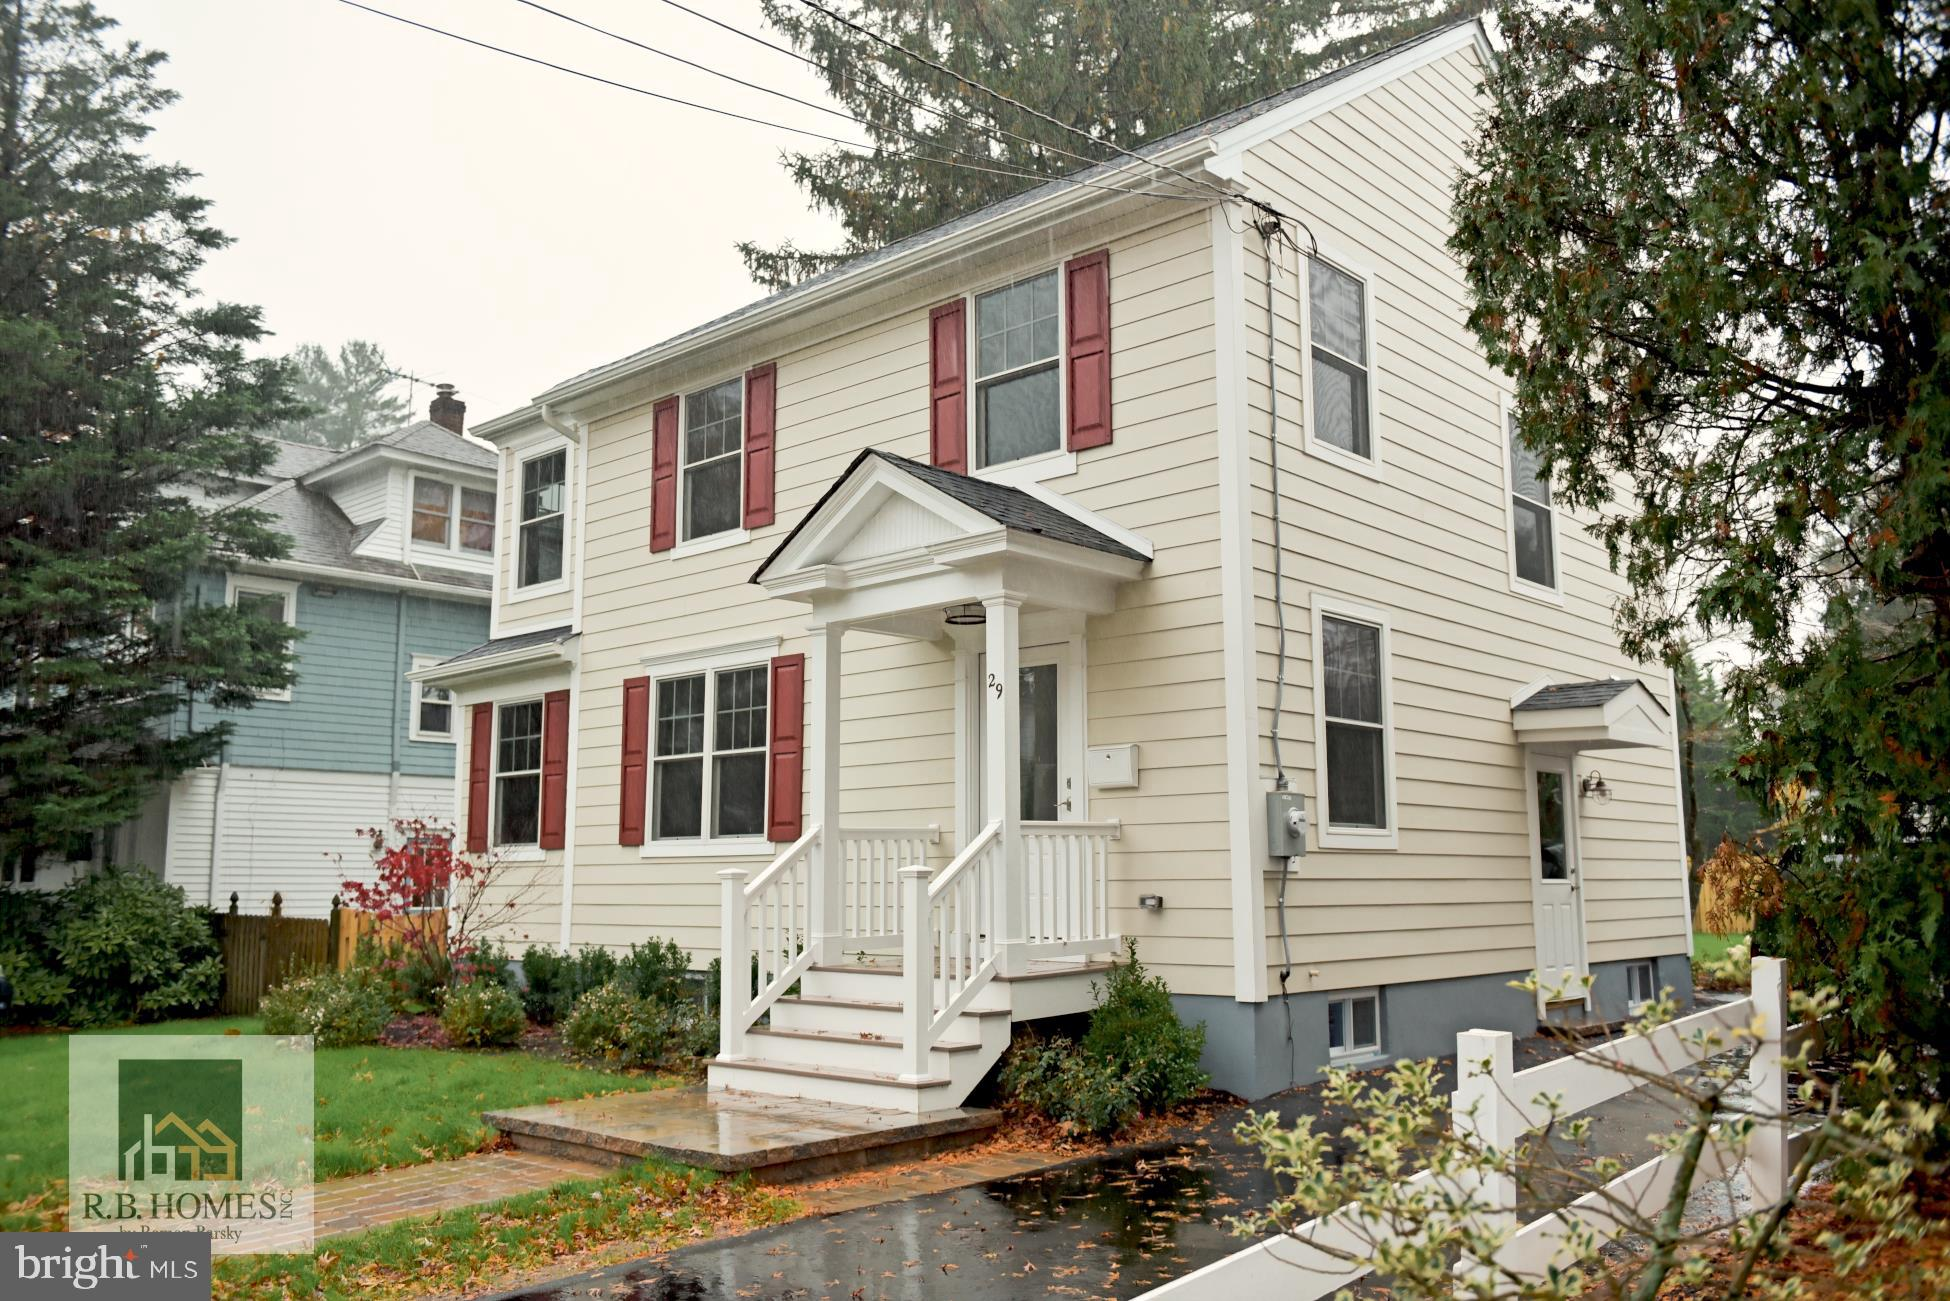 29 Wilton St, Princeton, NJ, 08540